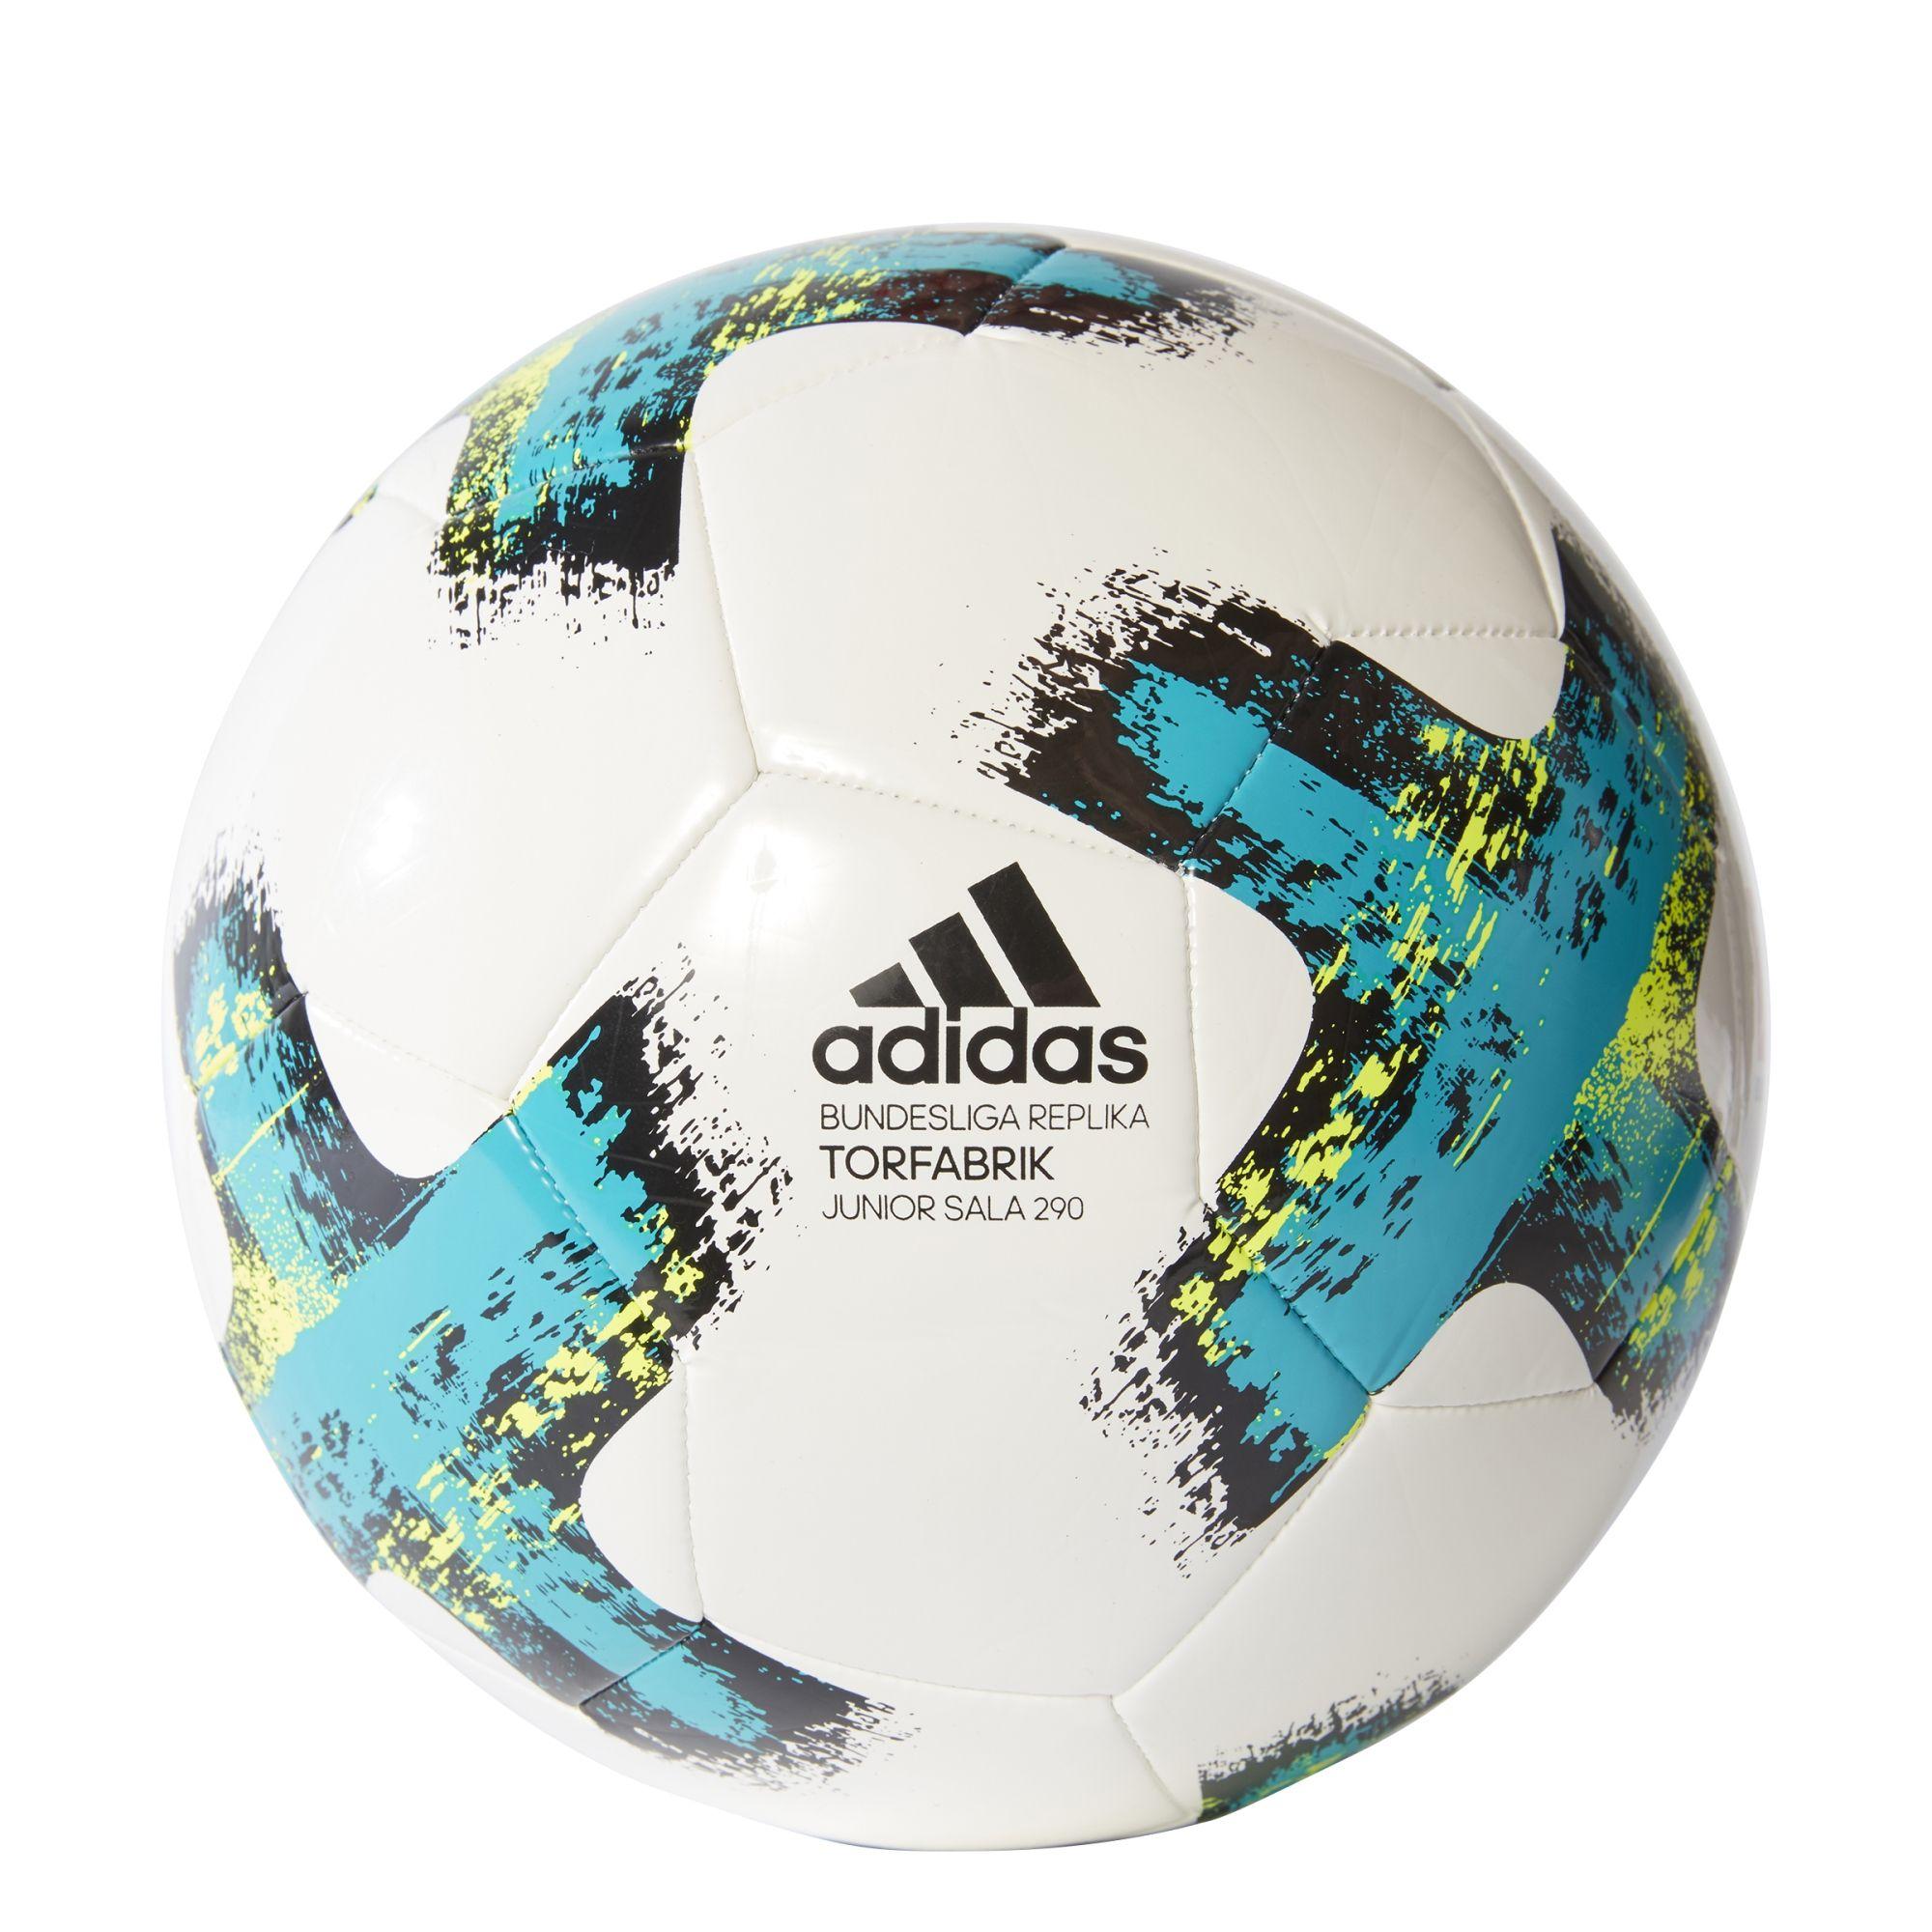 ADIDAS PERFORMANCE adidas Performance Fußball »Torfabrik Junior Sala 290 17/18«